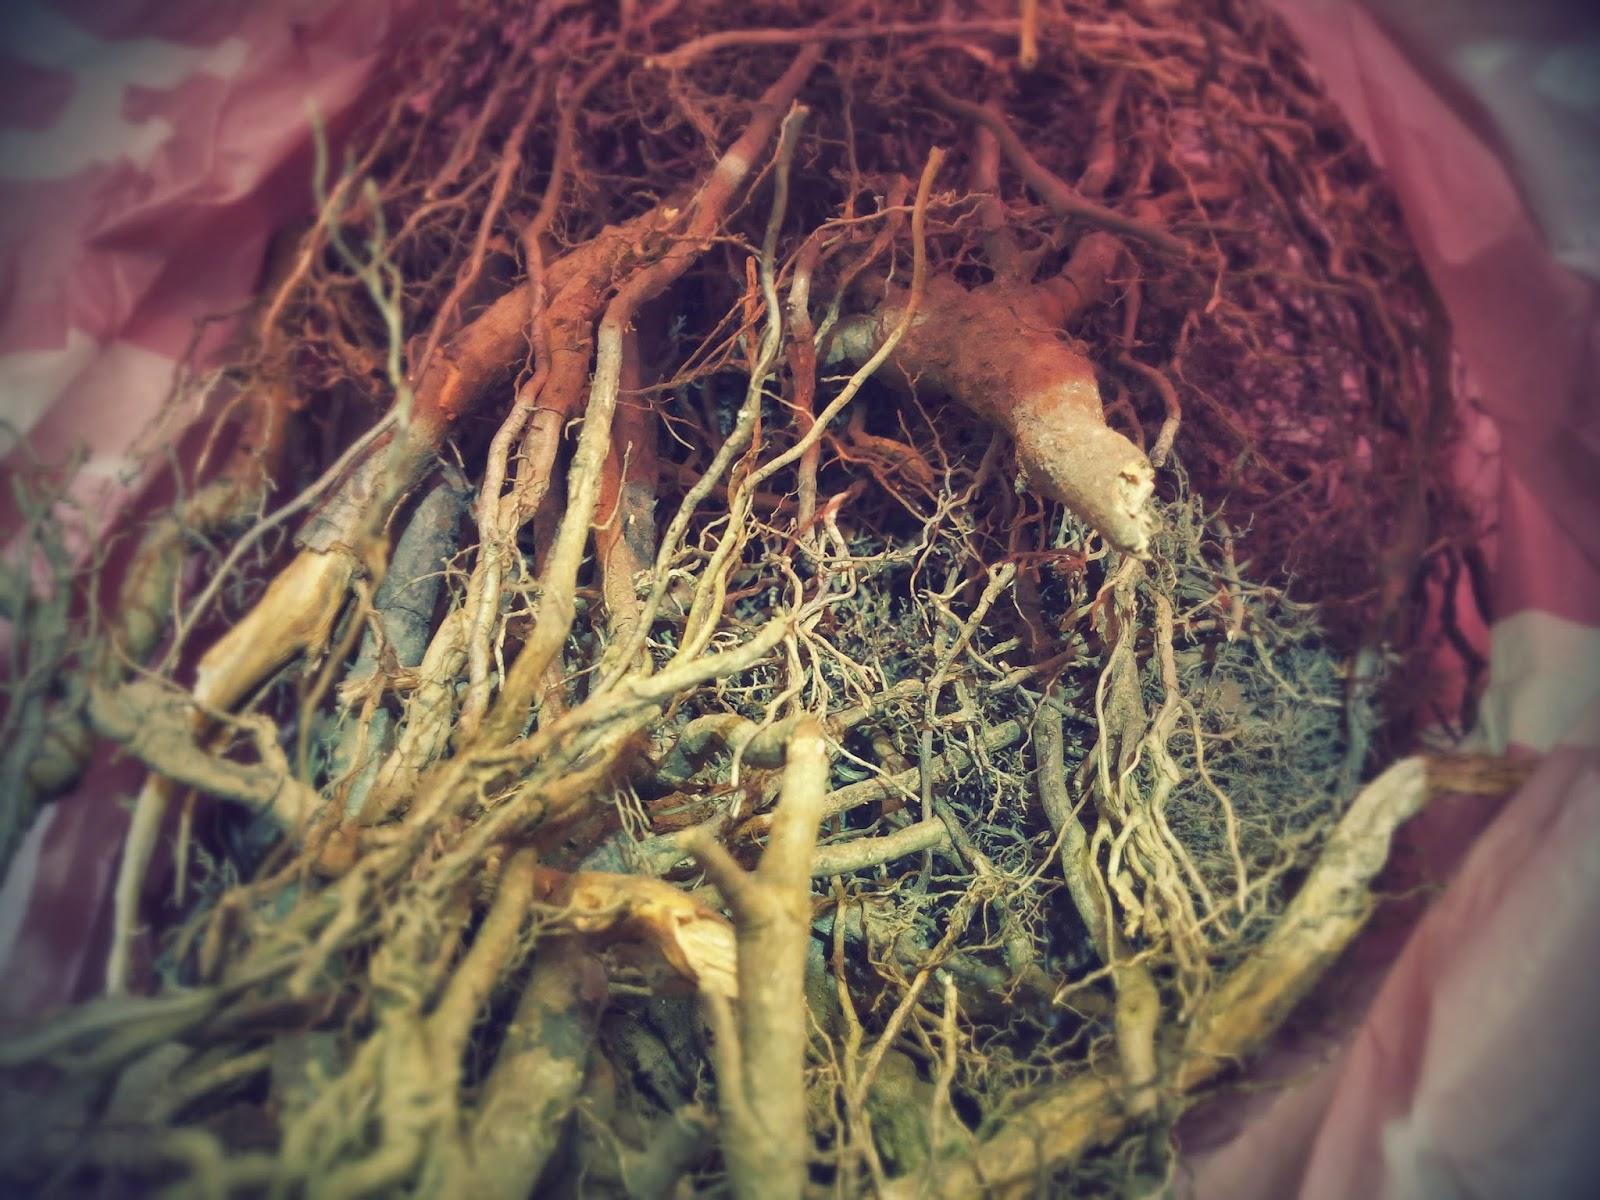 Massive Voodoo Tutorial: How to find good roots?